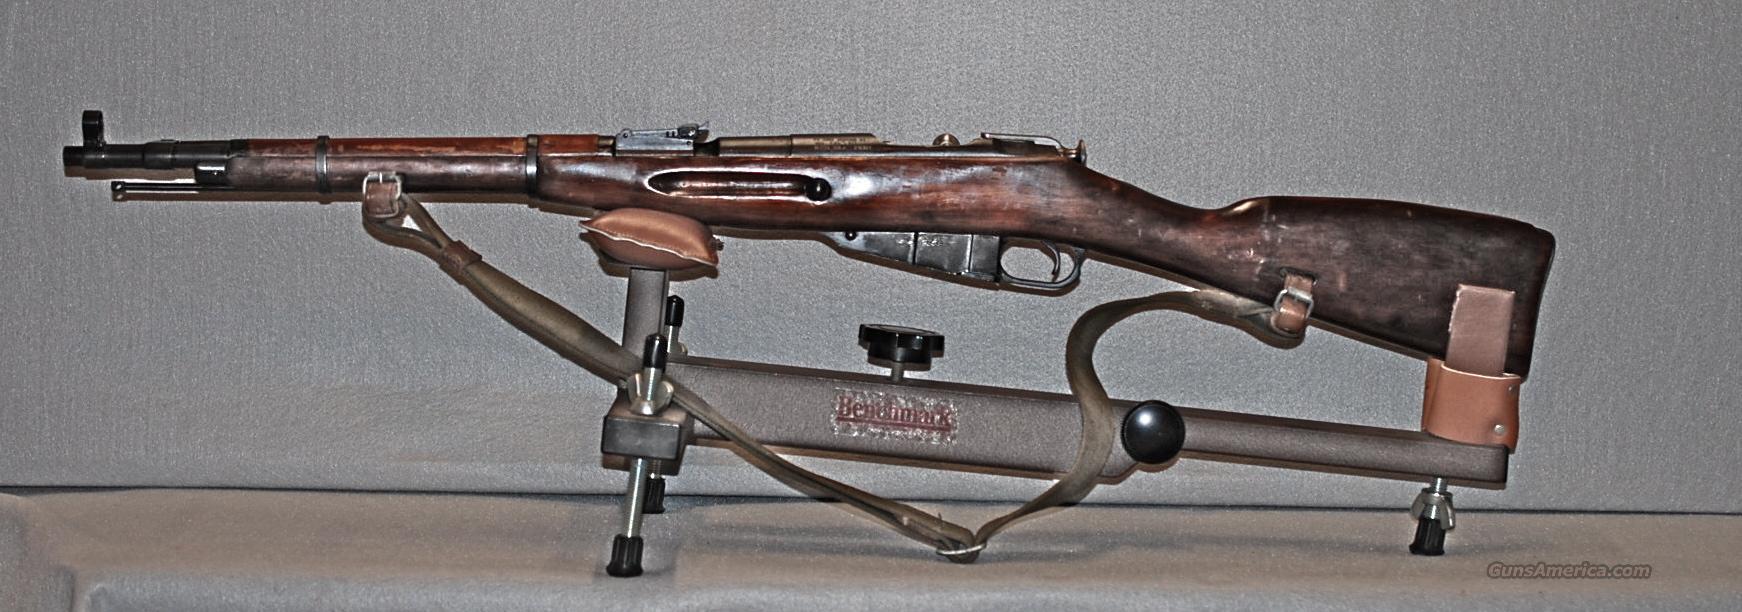 Mosin Nagant M44 carbine, Russian  Guns > Rifles > Mosin-Nagant Rifles/Carbines